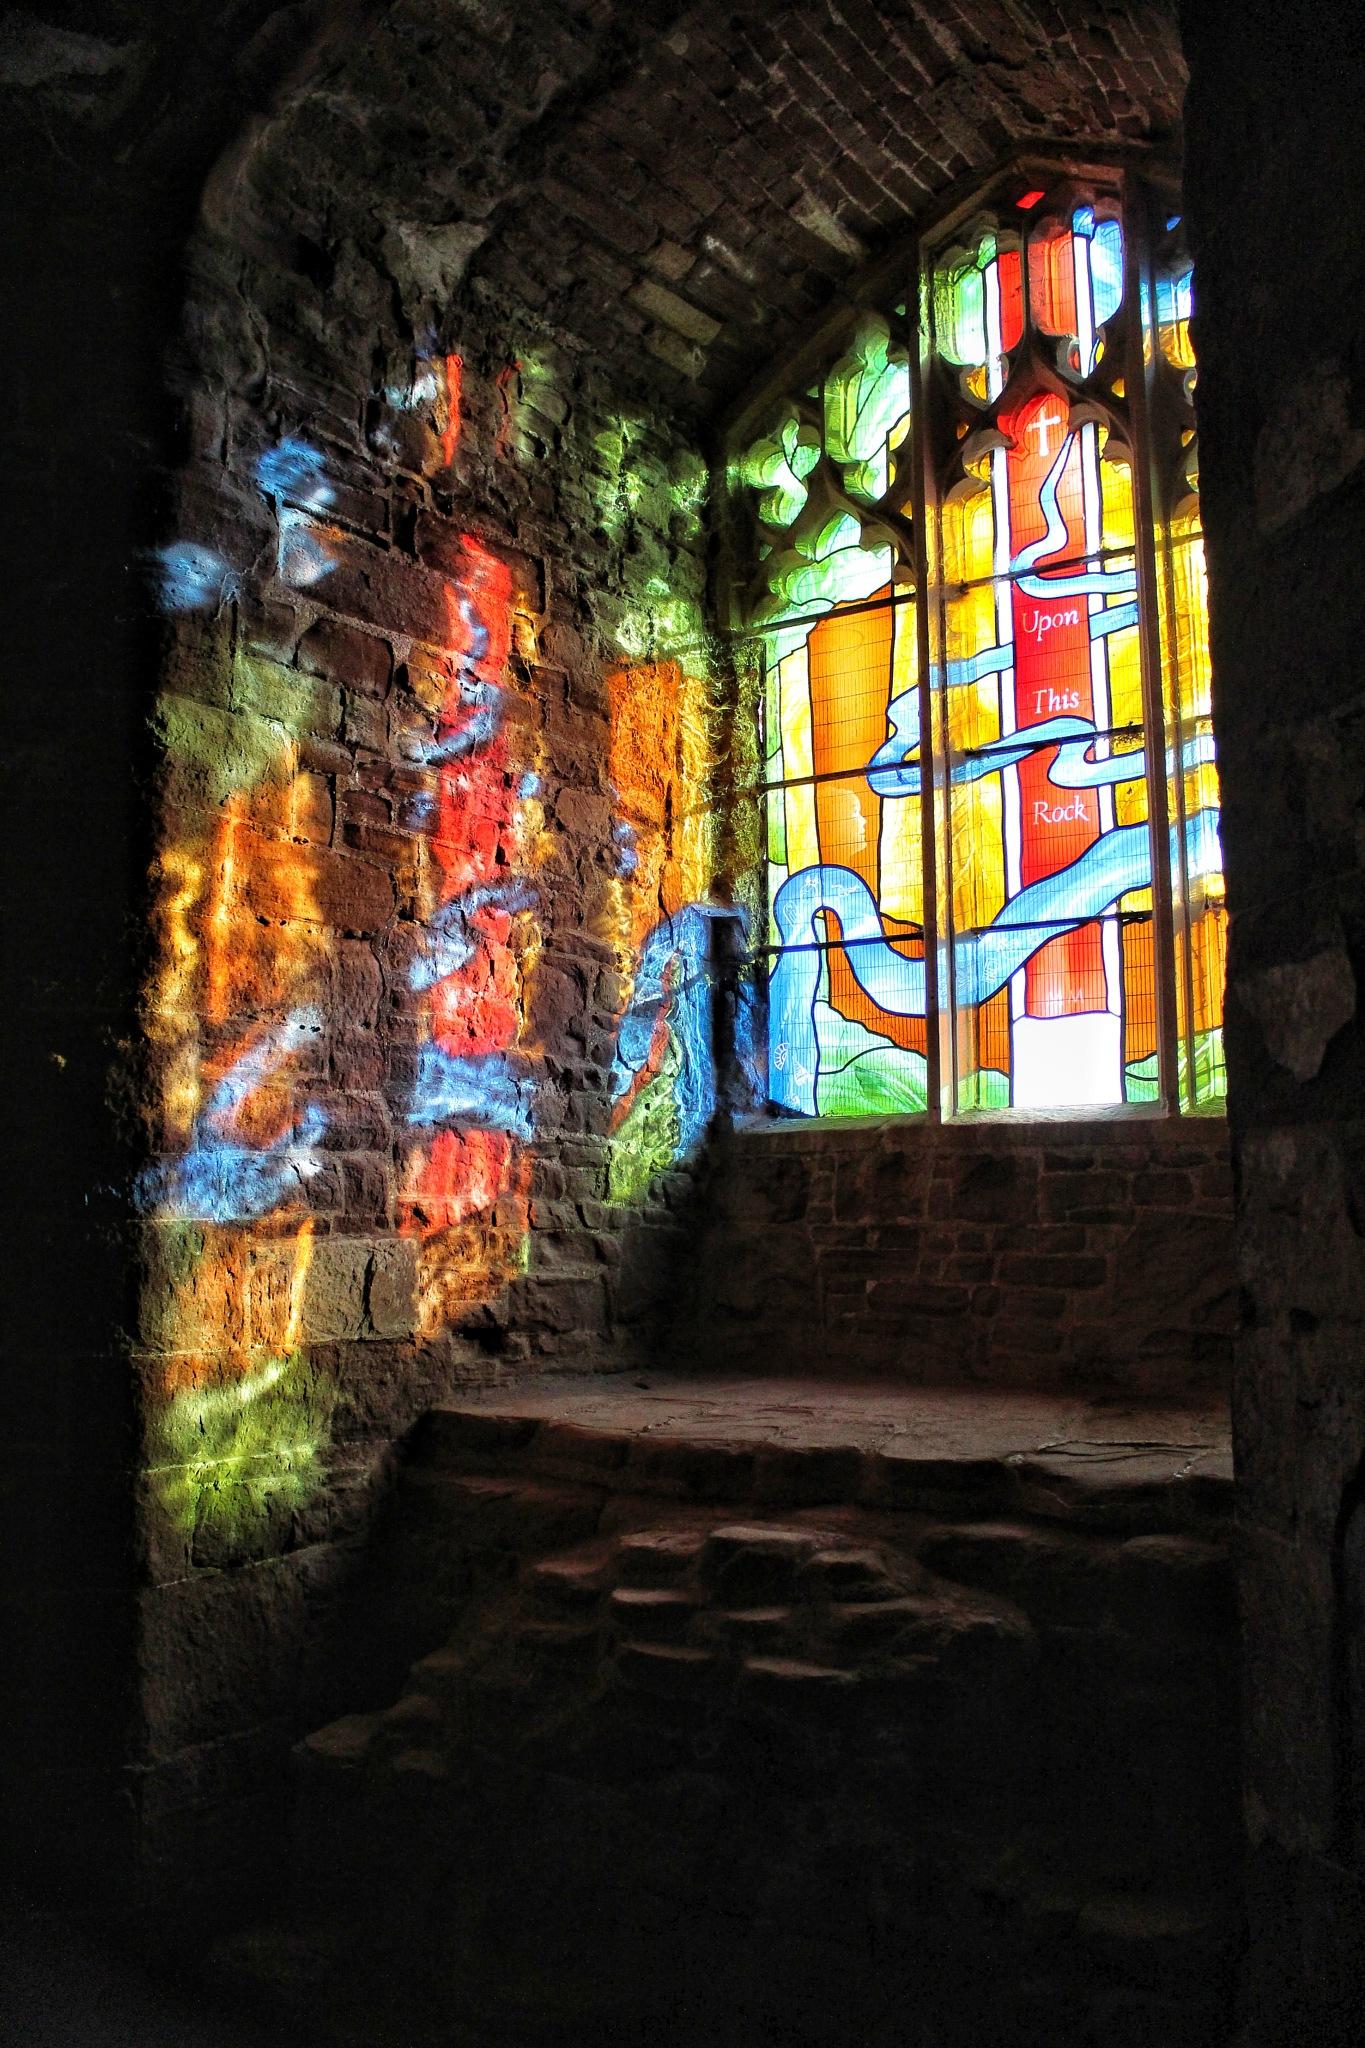 Window Light  by David65